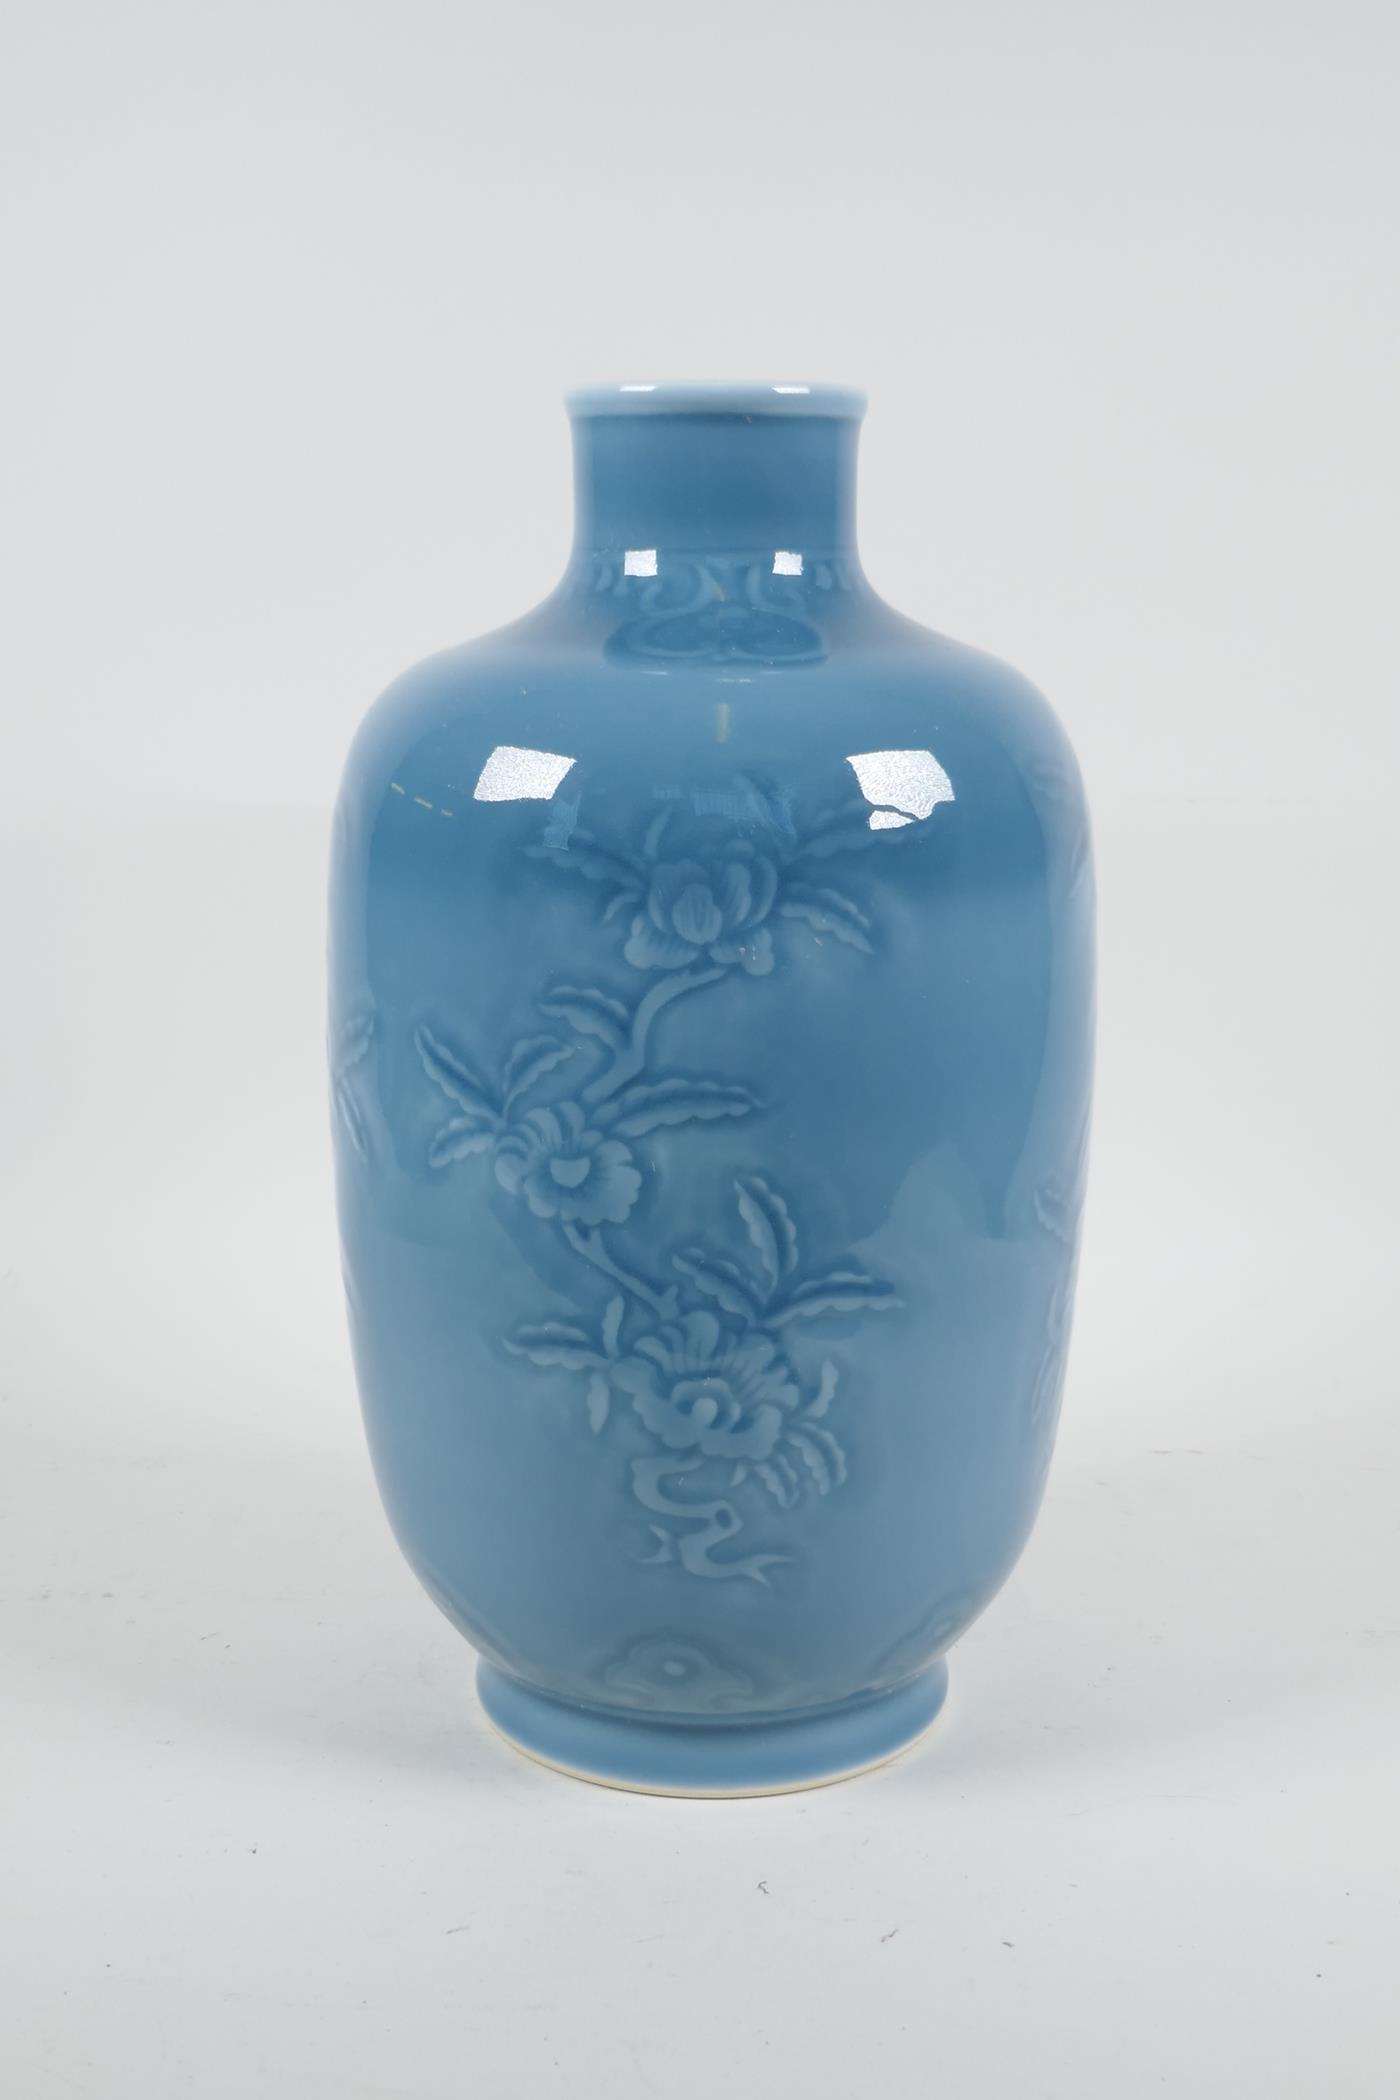 "A Chinese blue glazed porcelain vase with underglaze floral decoration, seal mark to base, 11"" high - Image 2 of 4"